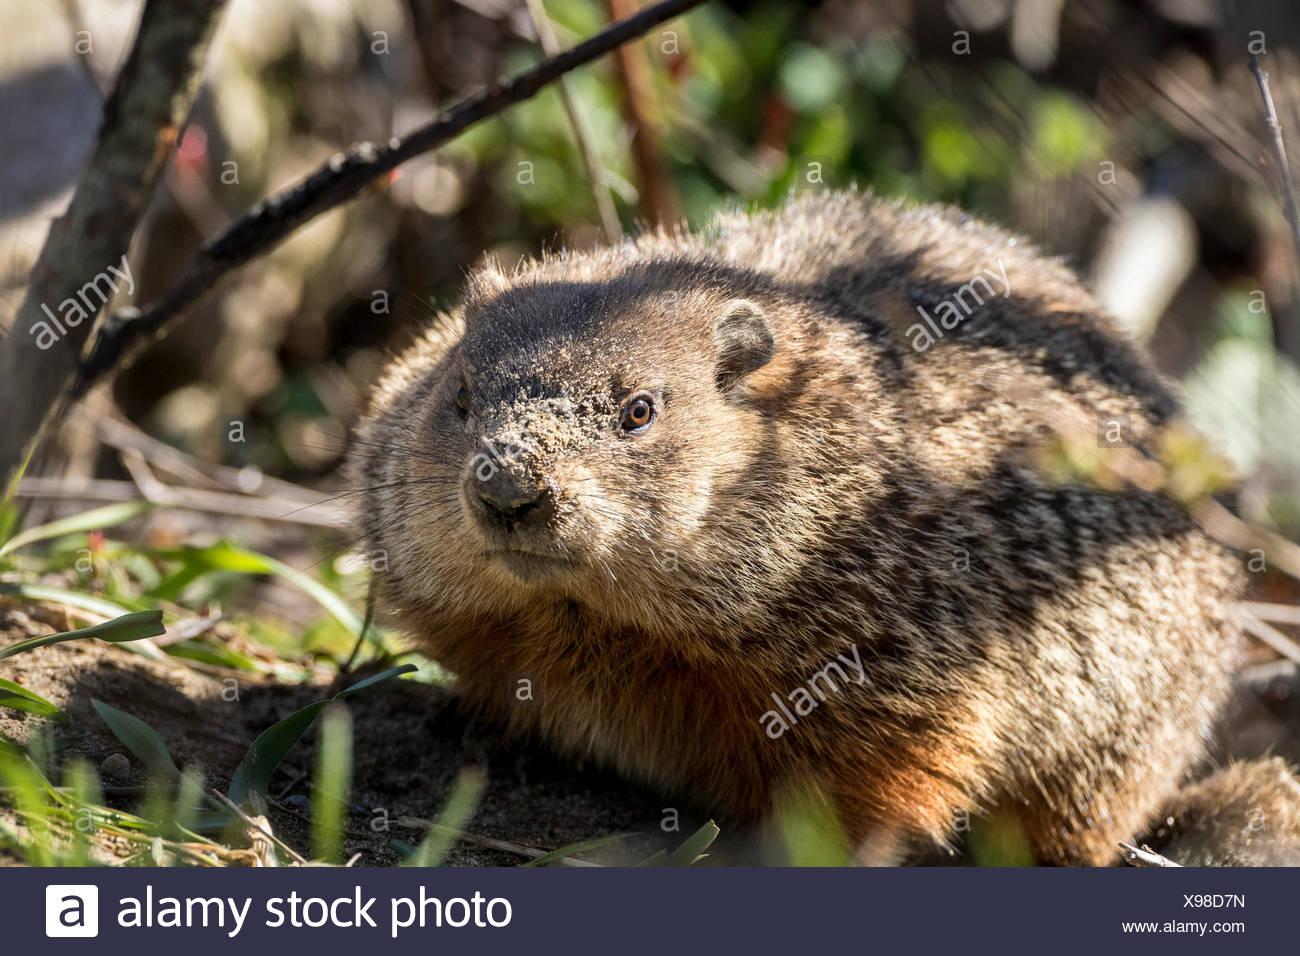 Groundhog or Woodchuck (Marmota monax), Barrie Island, Manitoulin Island, Ontario, Canada - Stock Image